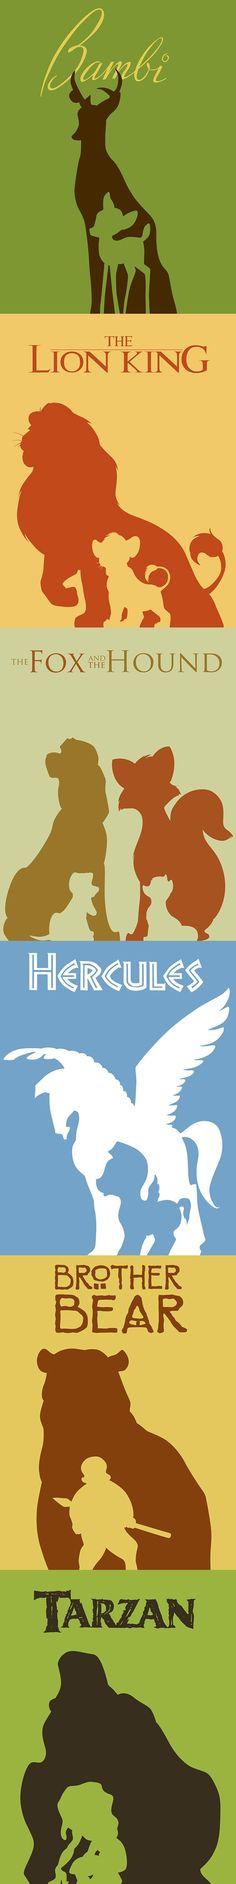 Negative form in Disney minimalist poster